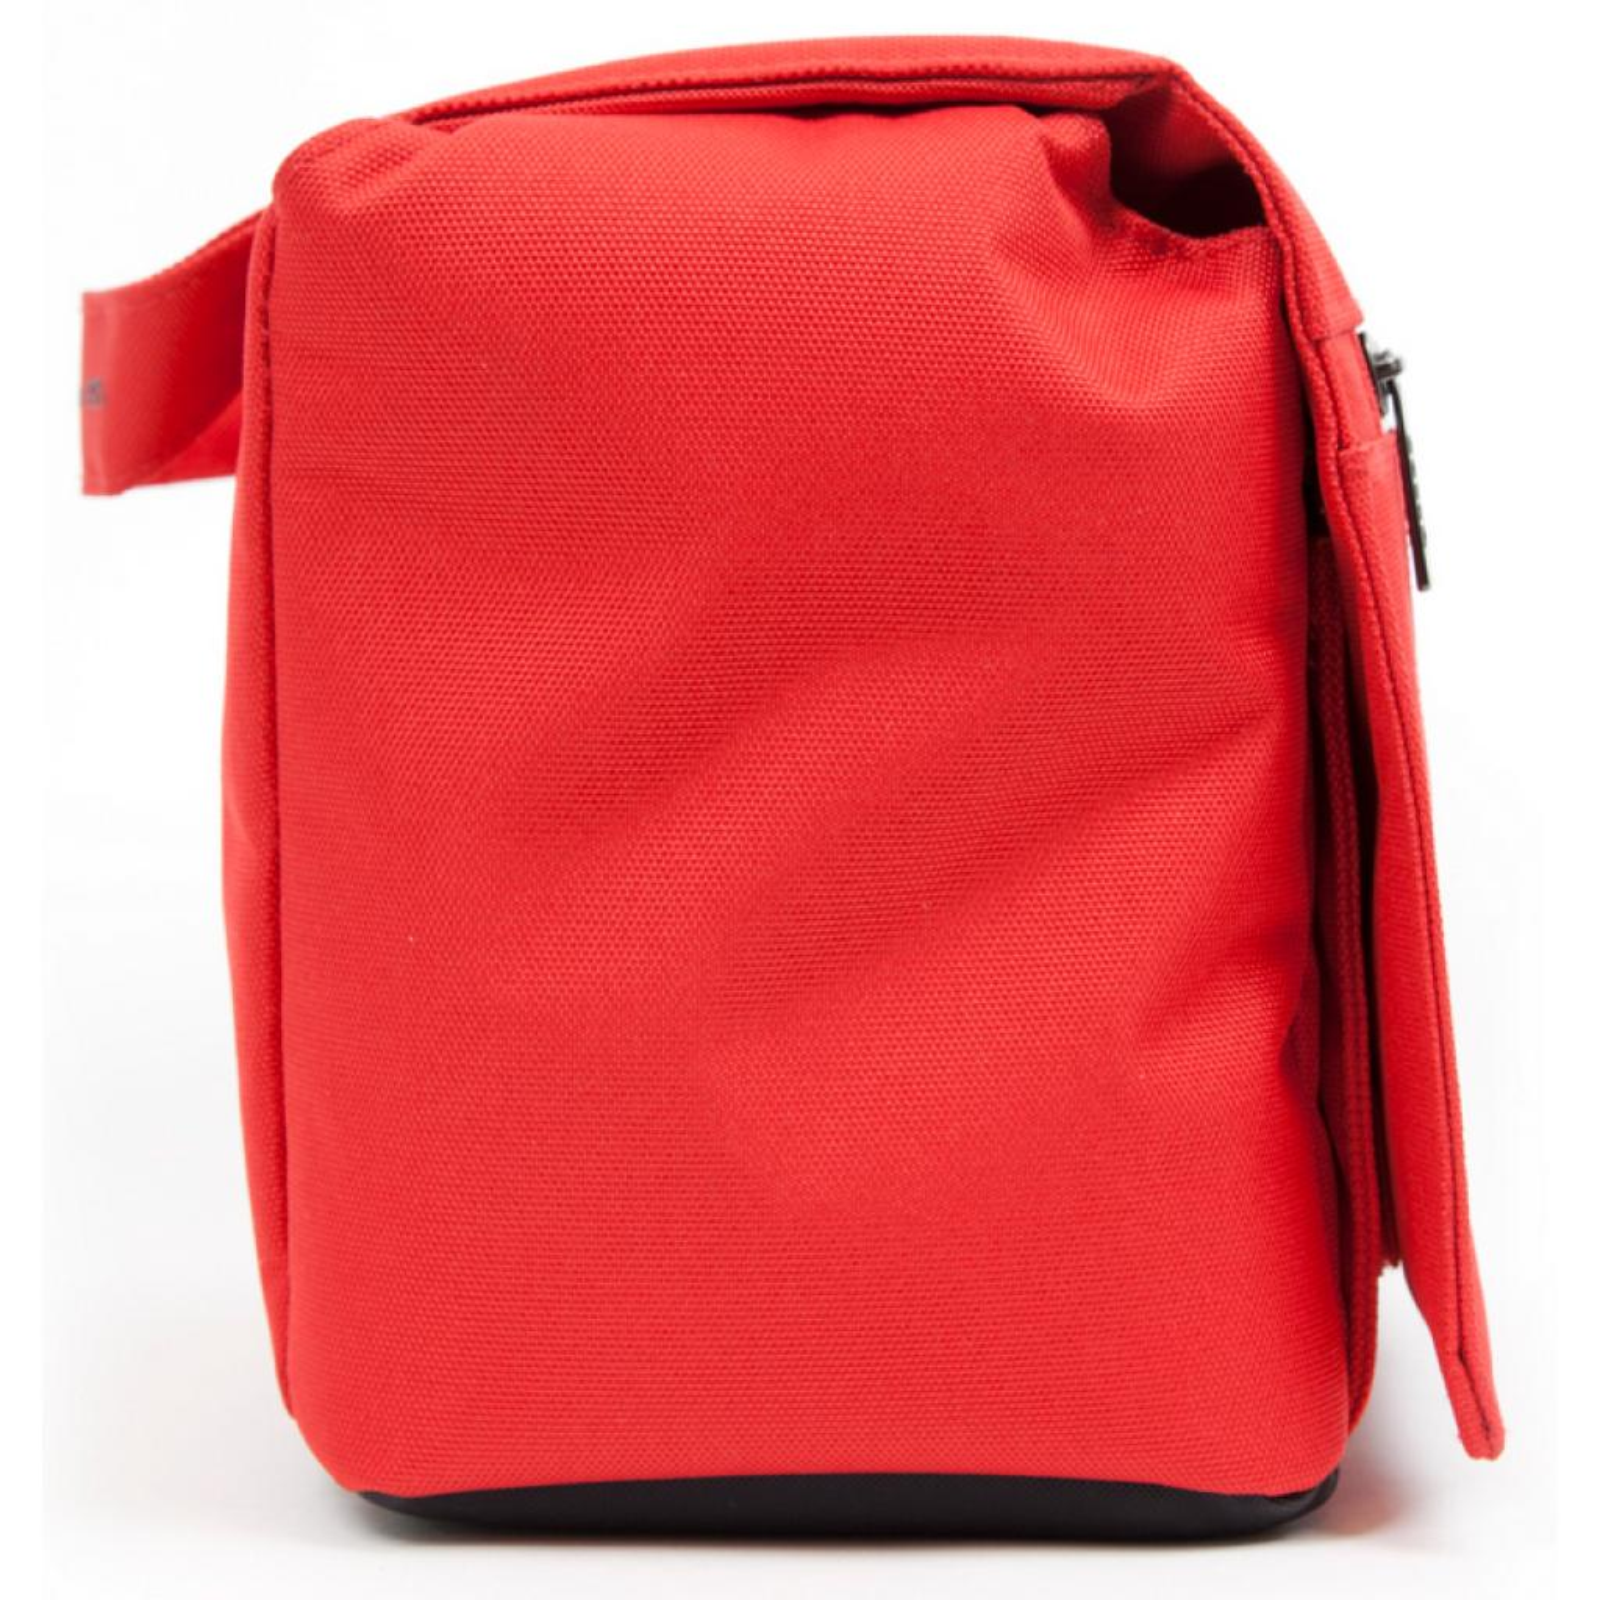 Фото-сумка Golla CAM BAG M Mico PVC/polyester /red (G1371) изображение 3